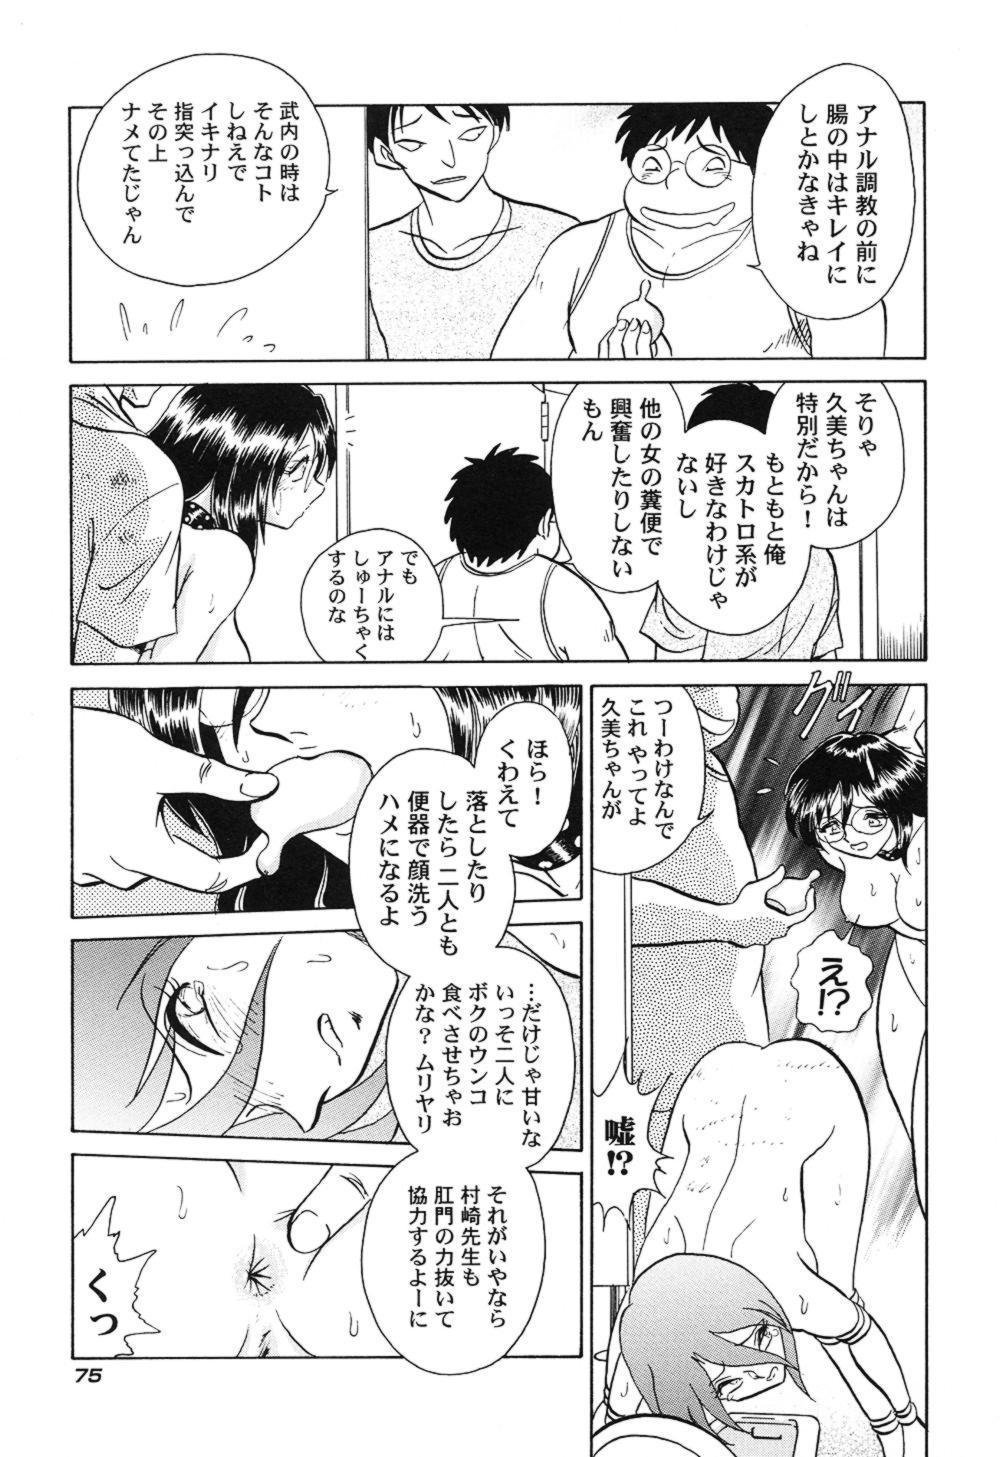 Hageshii Kagai Jugyou 77